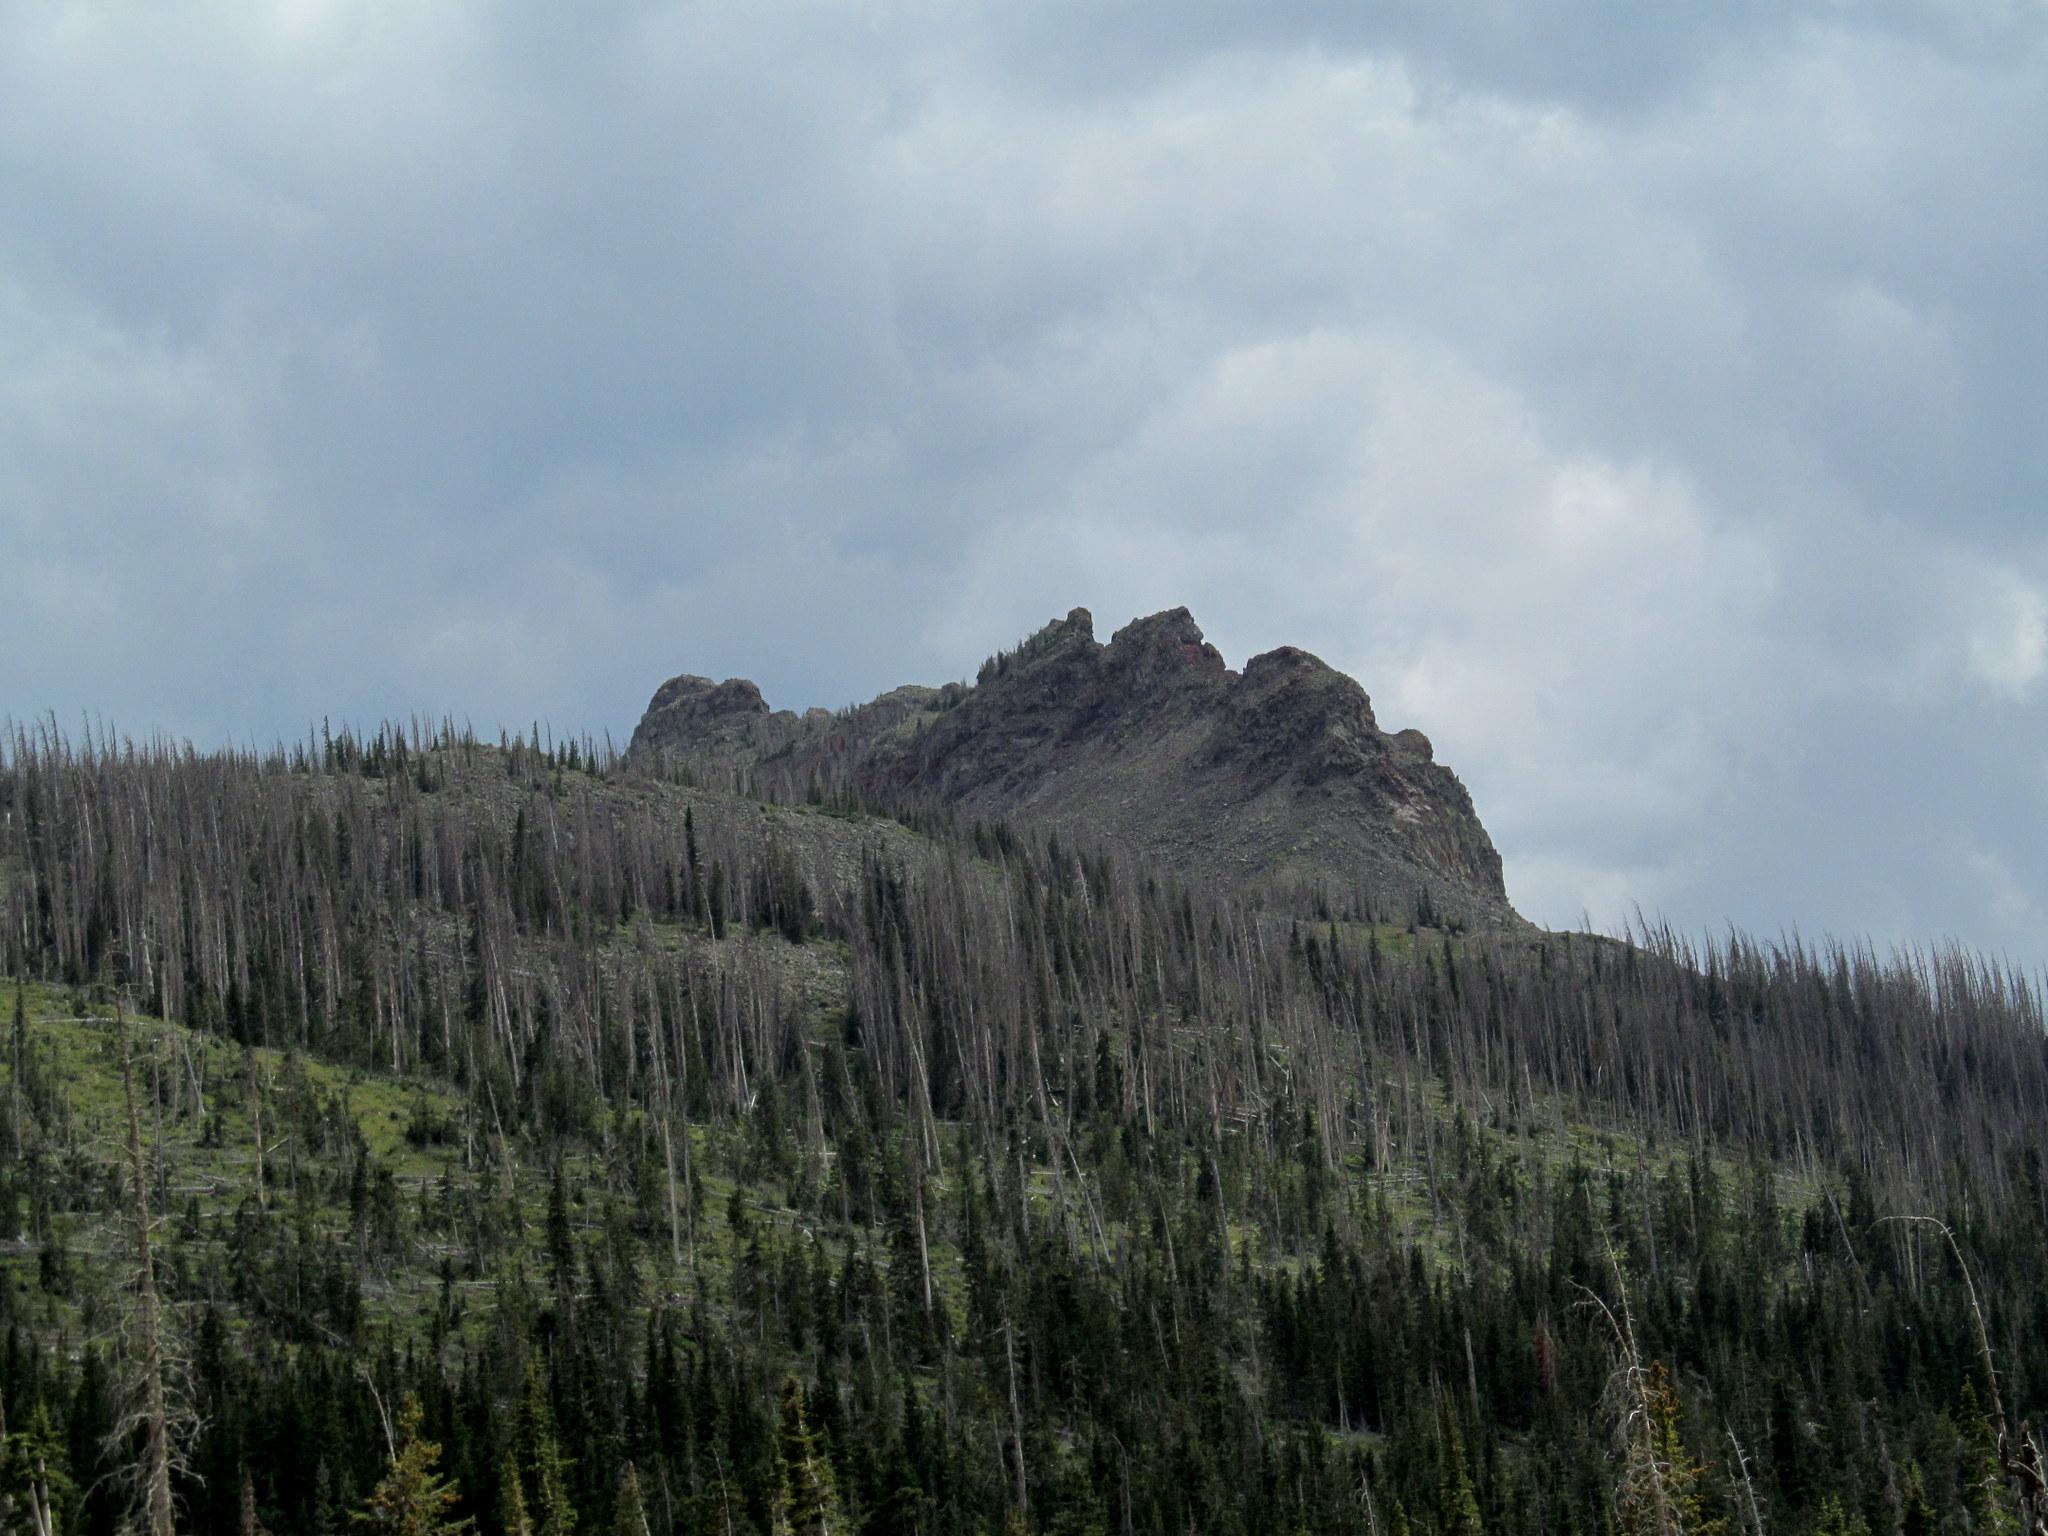 Photo: Marvine under an increasingly cloudy sky